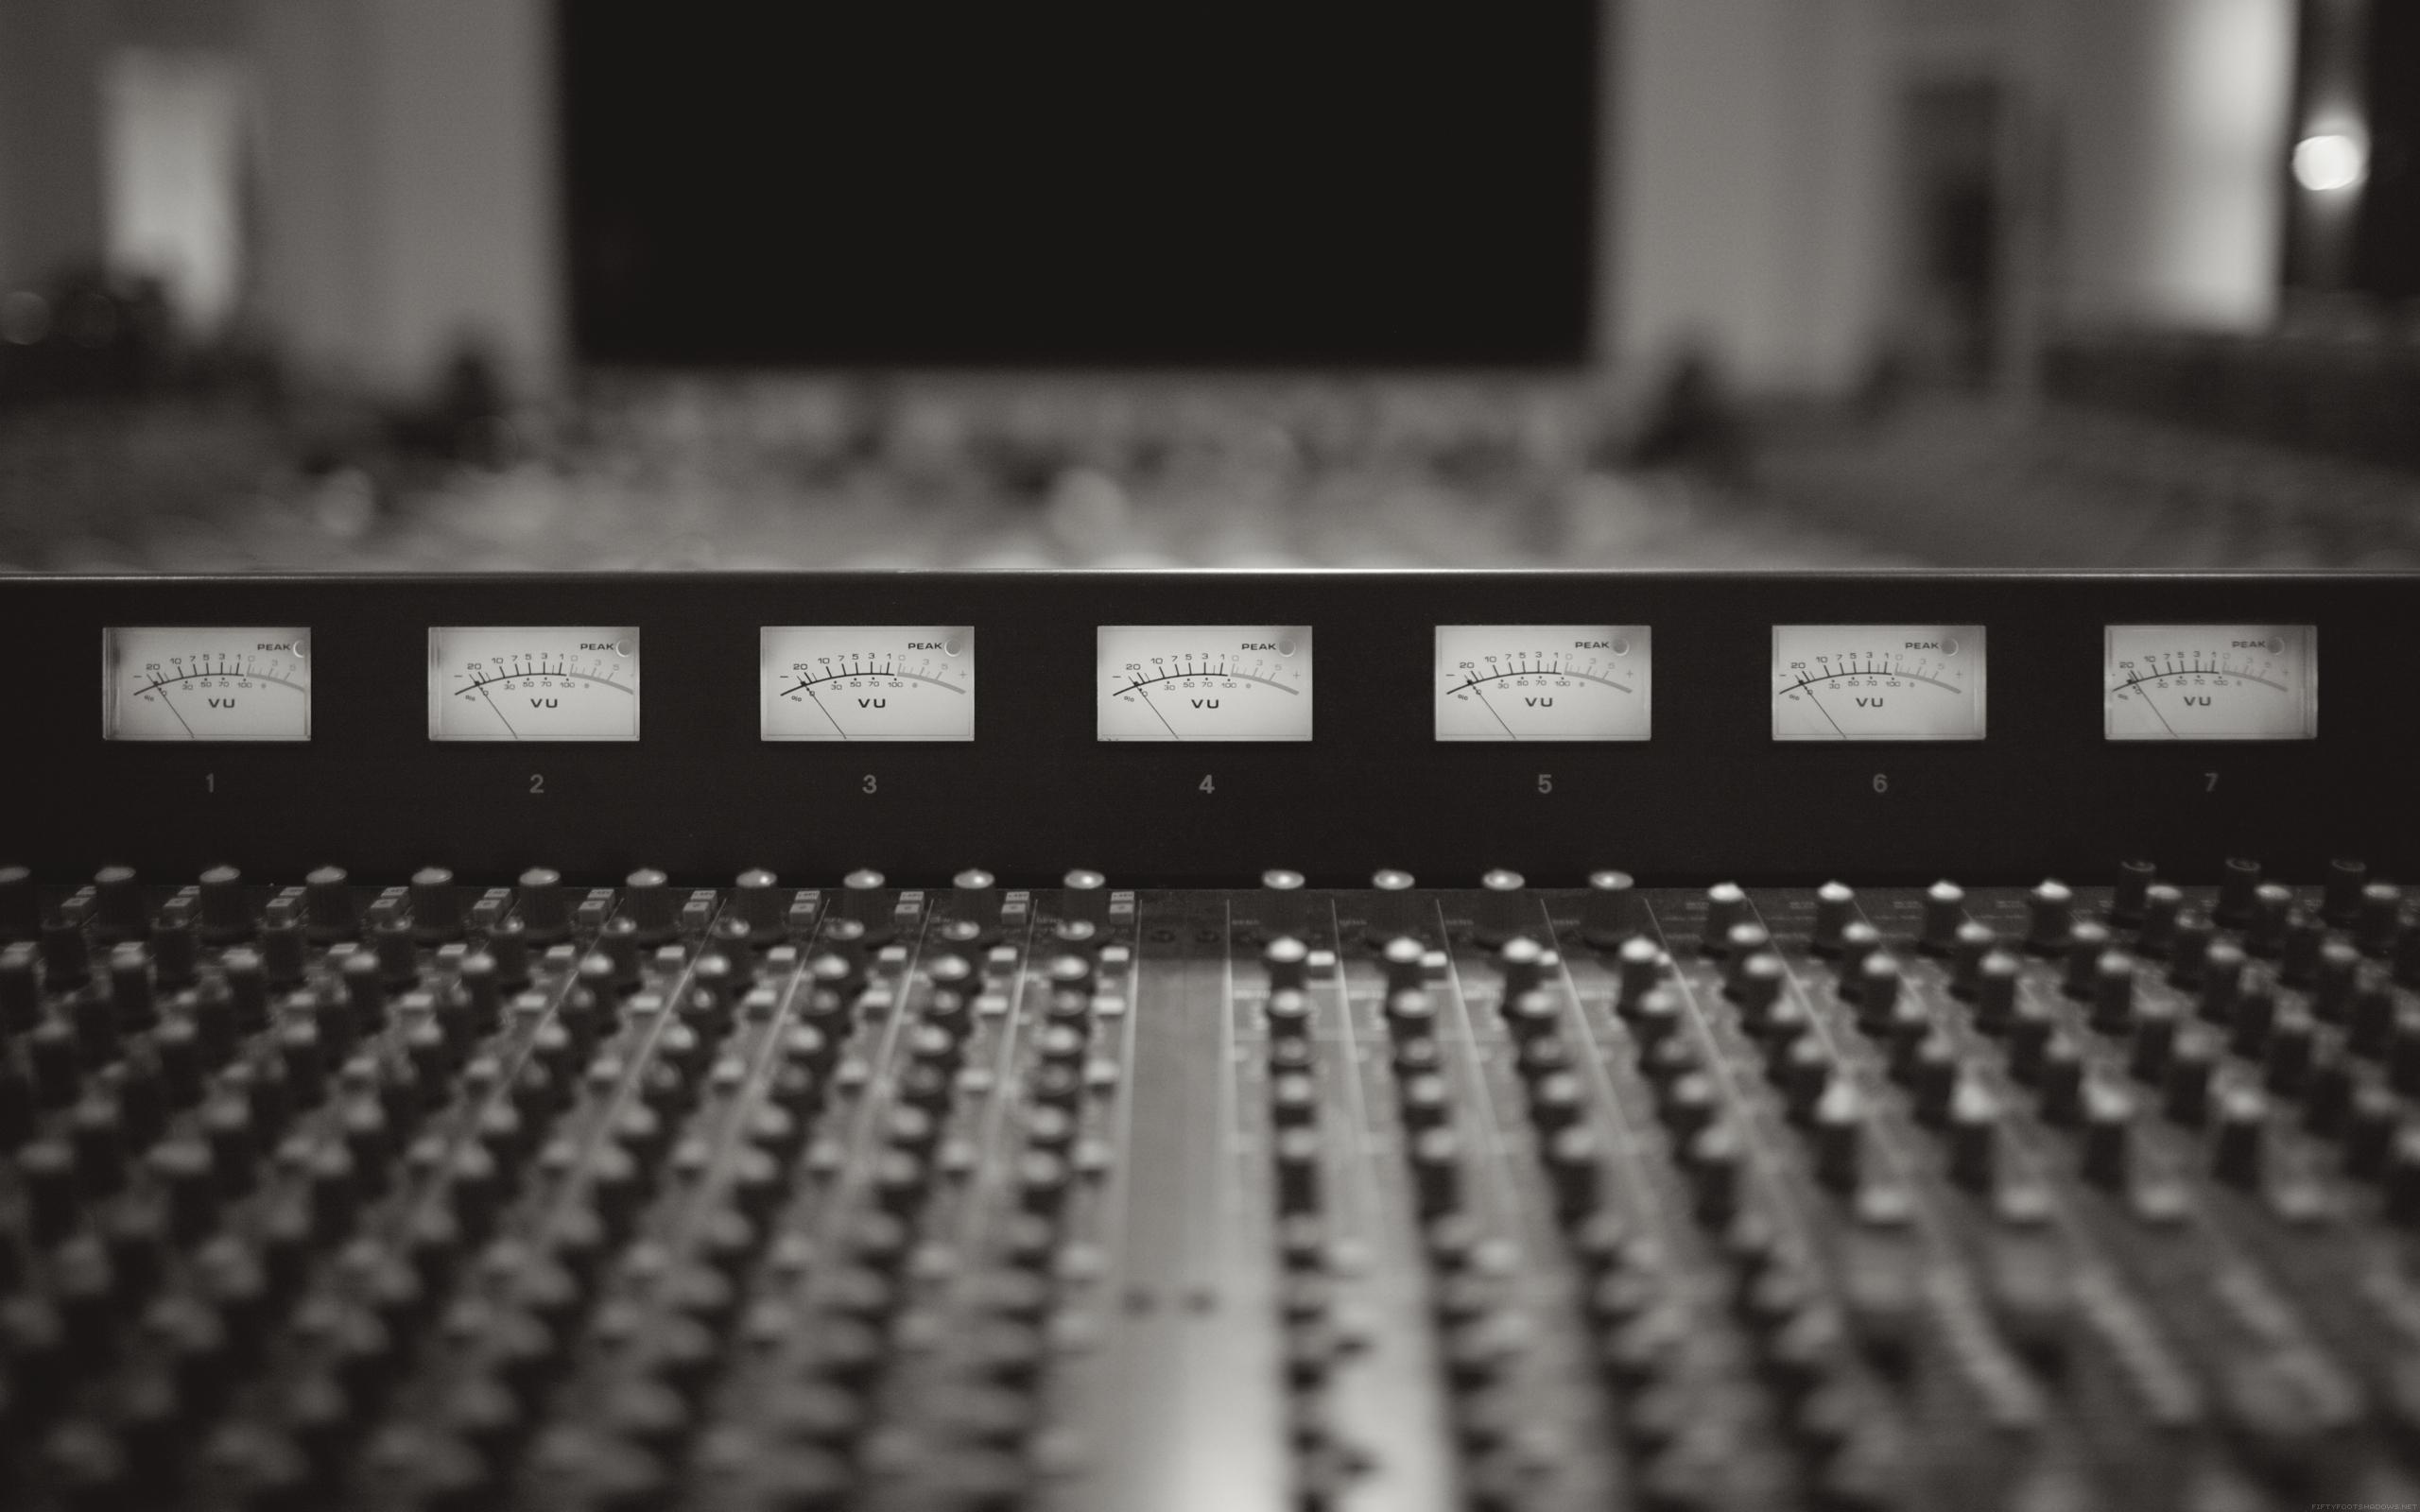 Cool recording studio wallpapers wallpapersafari - Music recording studio wallpaper ...